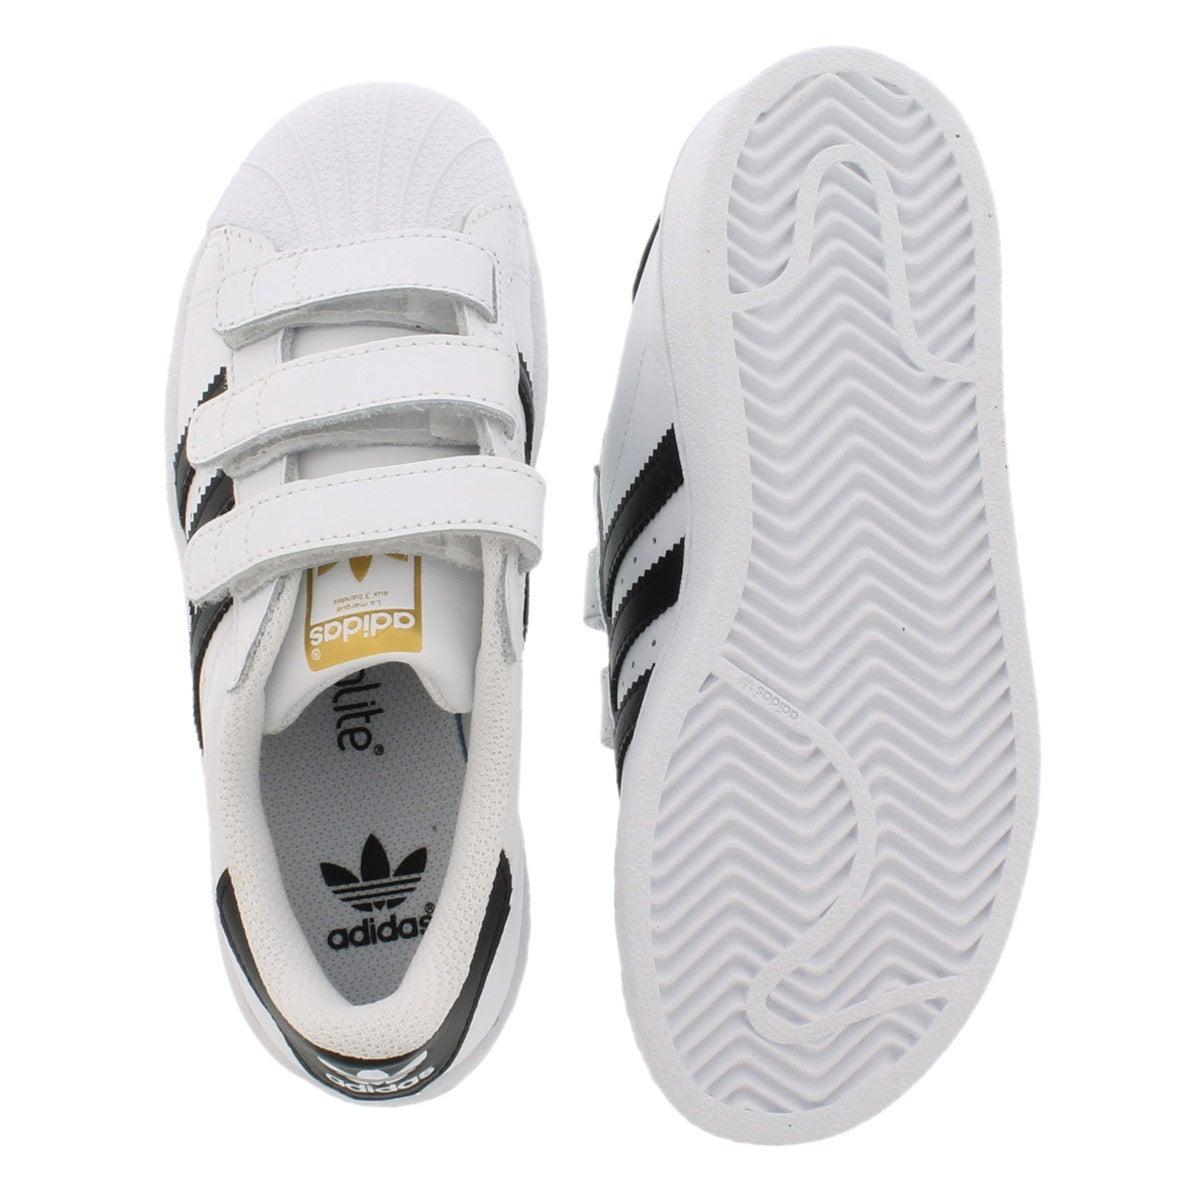 Bys Superstar Foundation wht/blk sneaker